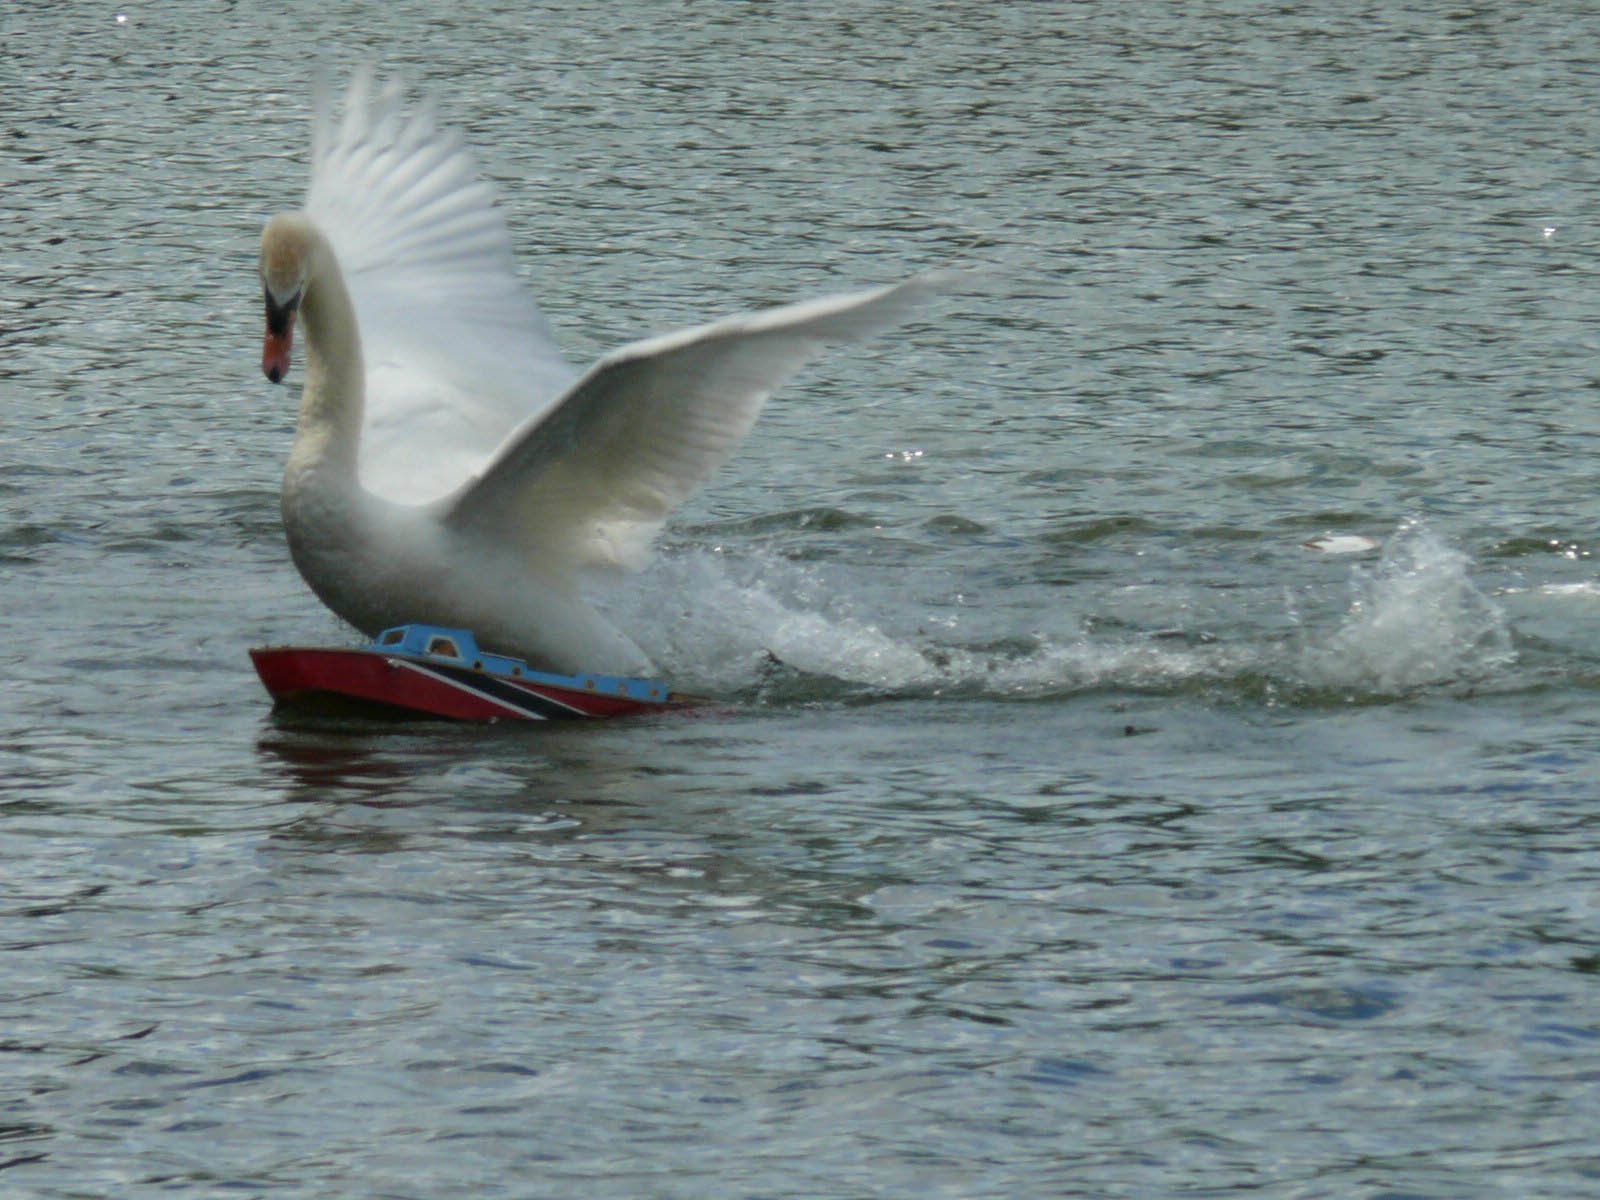 Swan attacks model boat